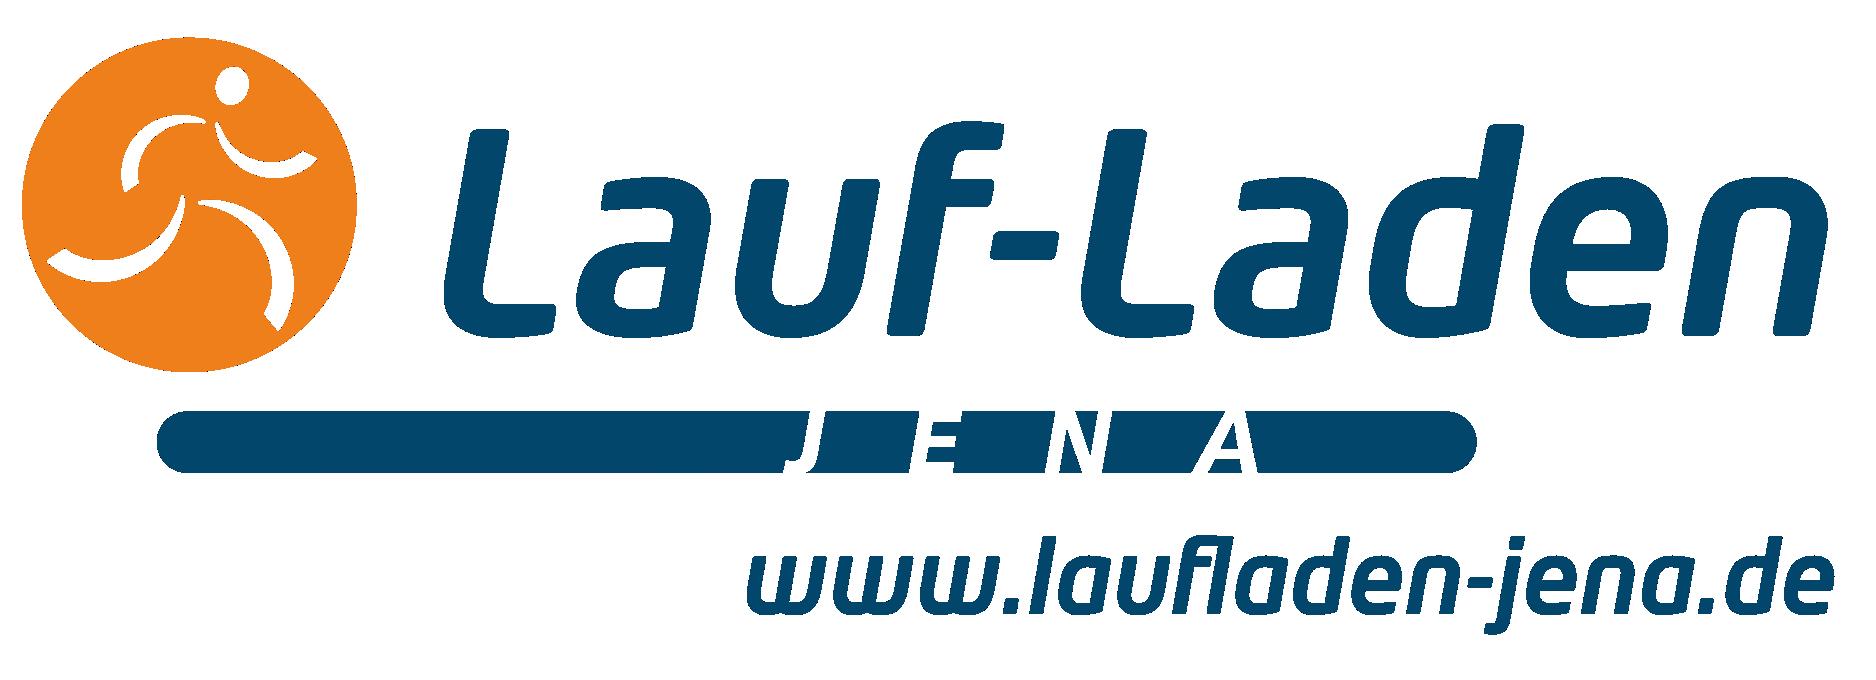 Laufladen Jena